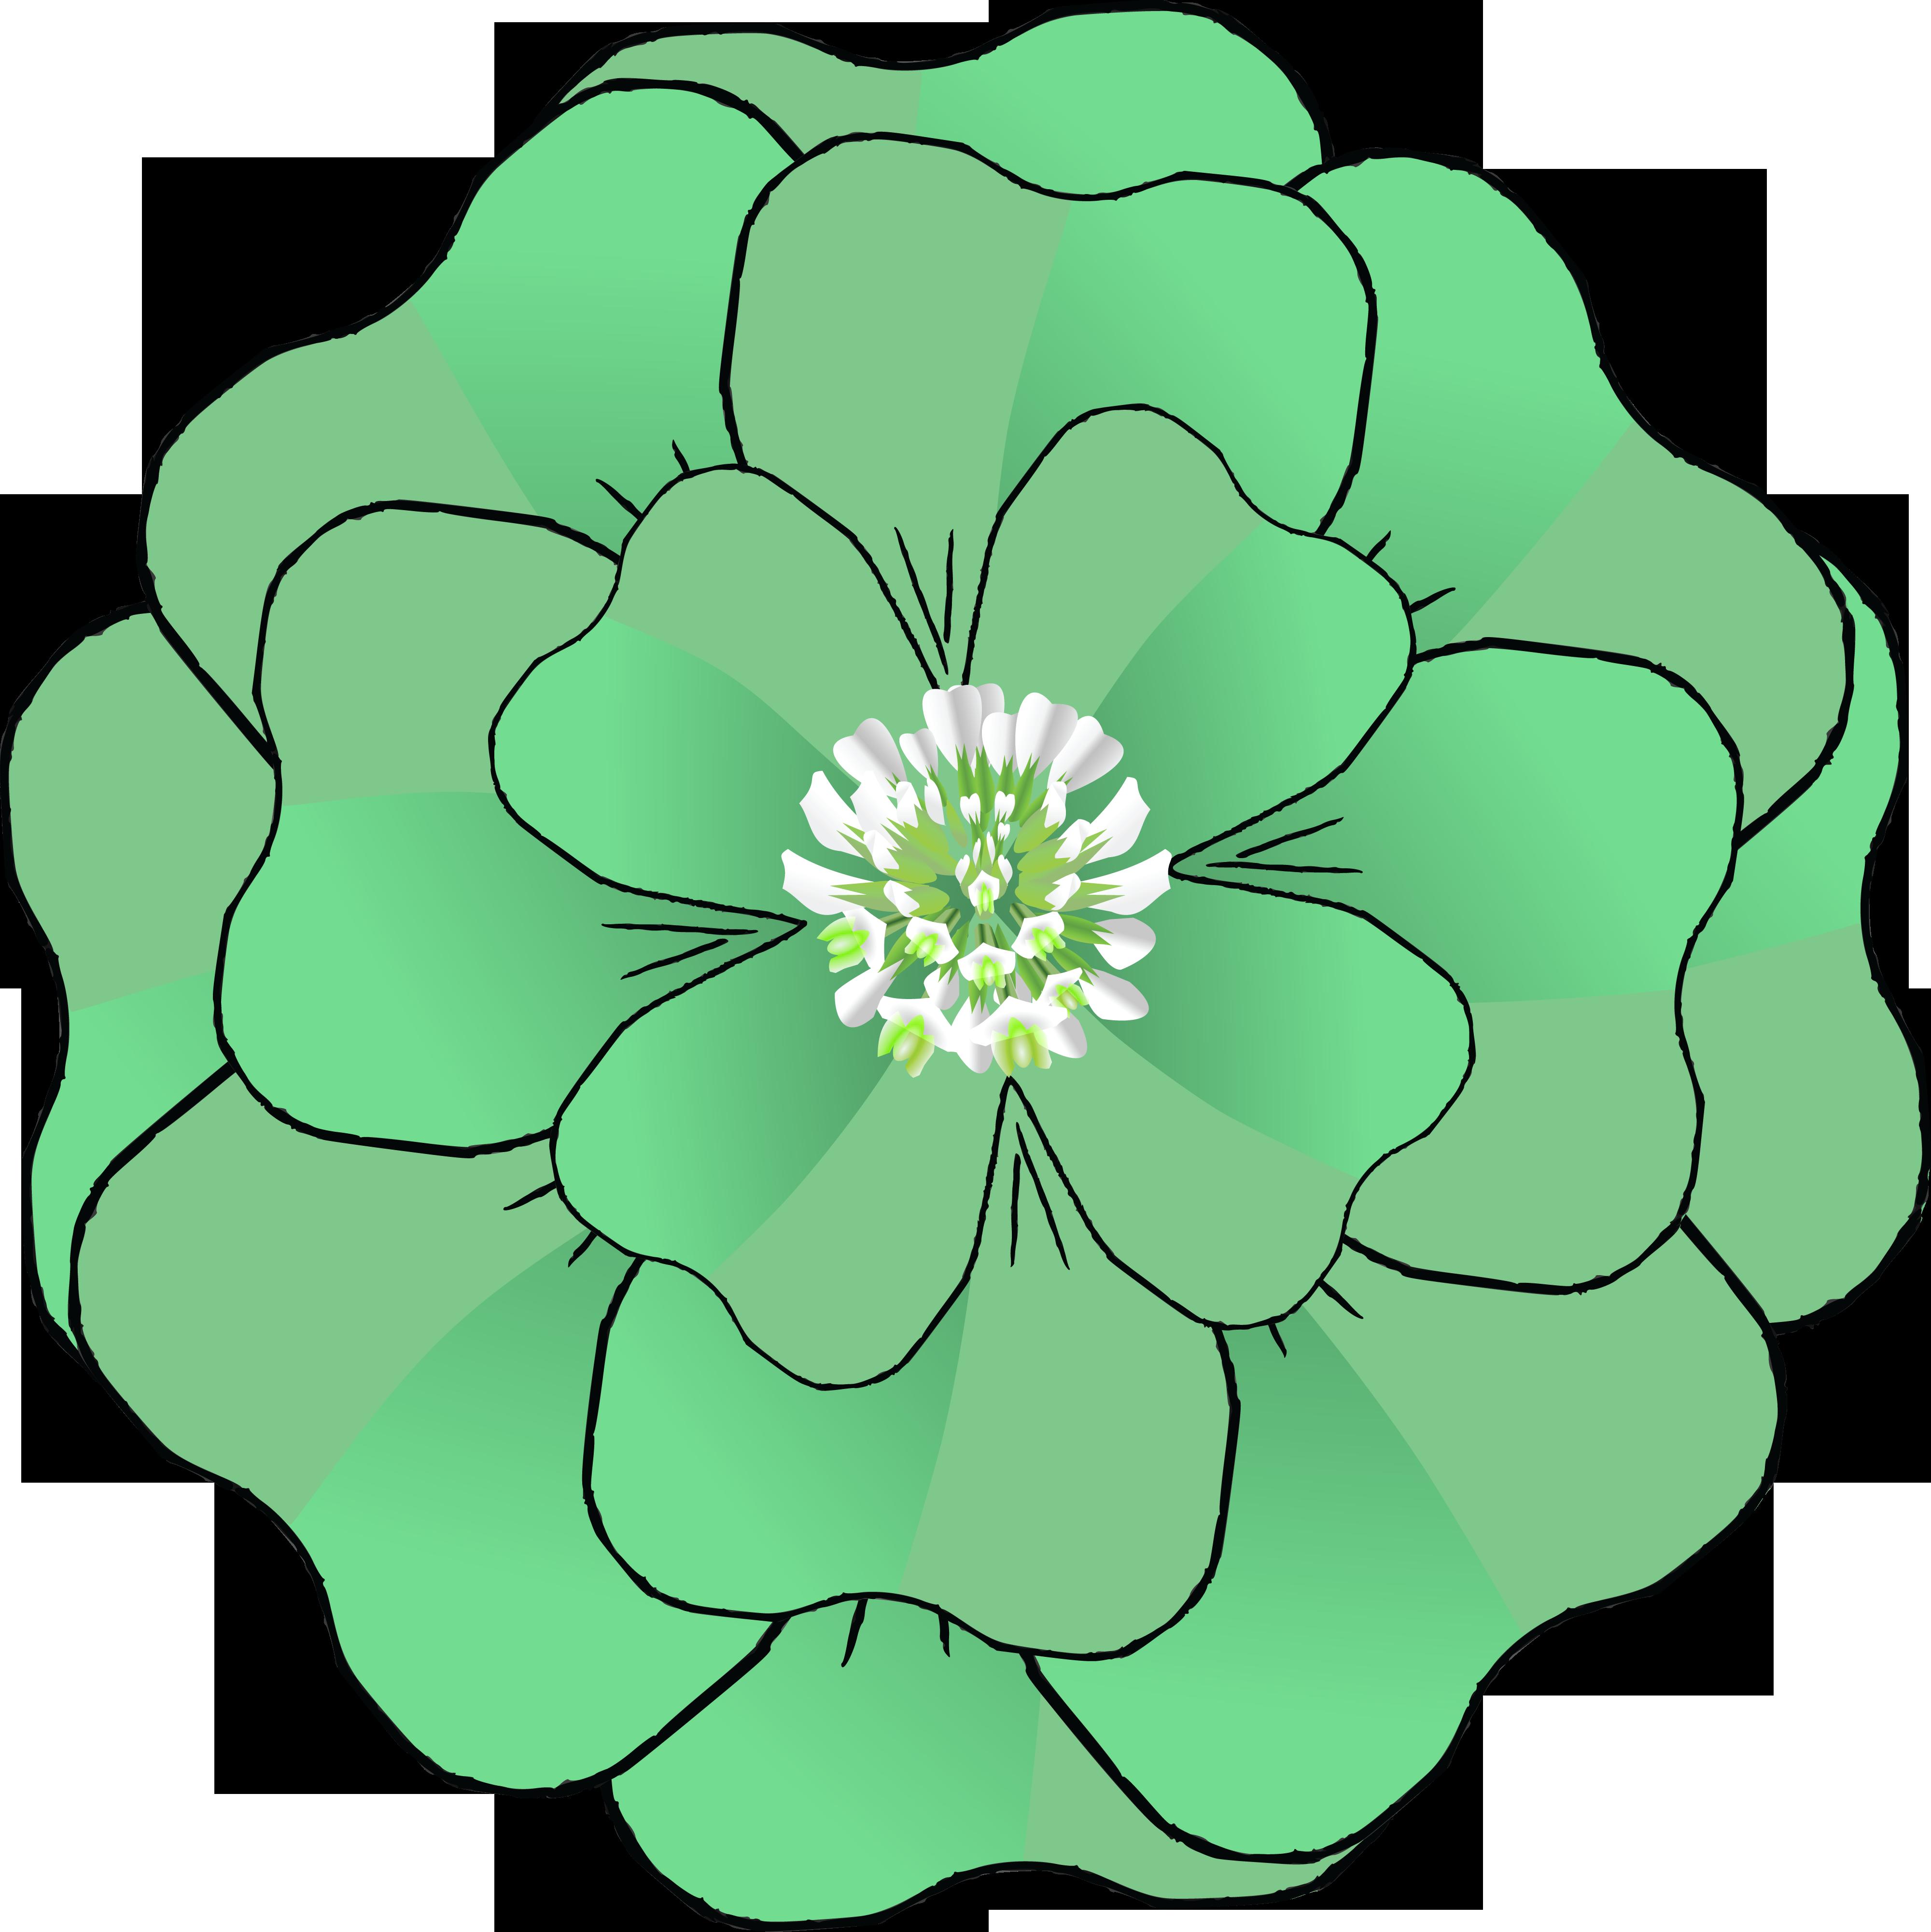 free clipart of a st patricks day green four leaf clover shamrock clip art vector free shamrocks clip art free